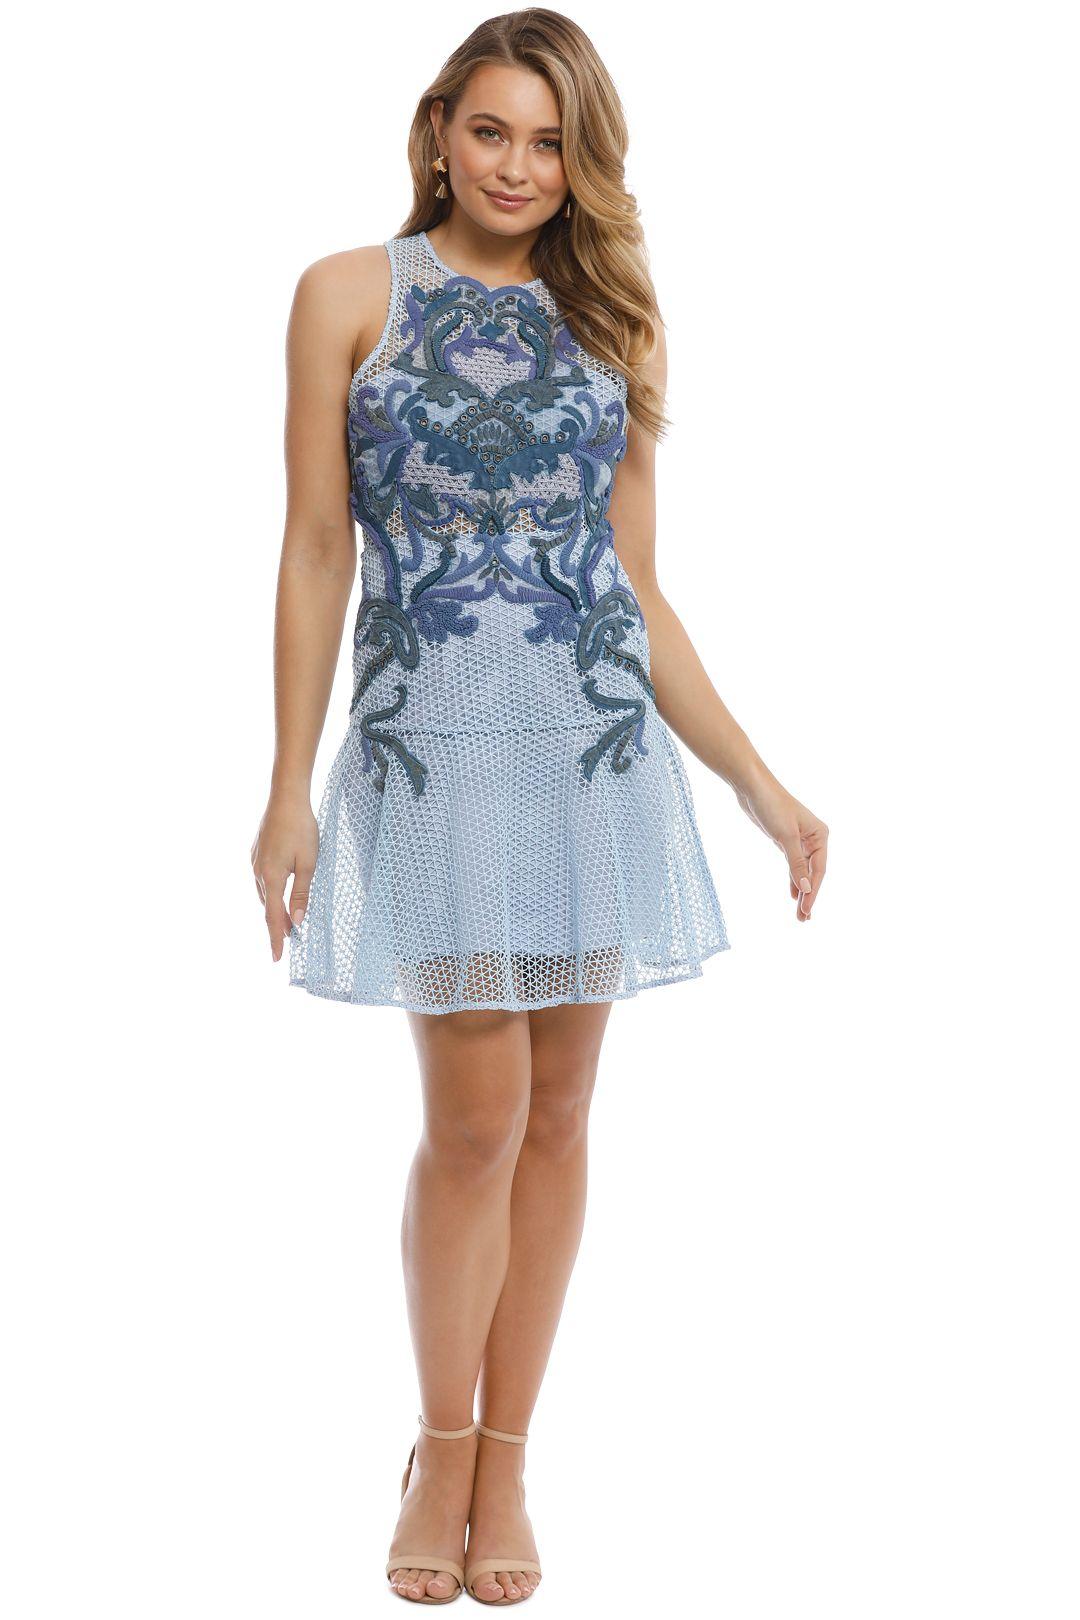 Thurley - Mid Summer Night Dream Dress - Front